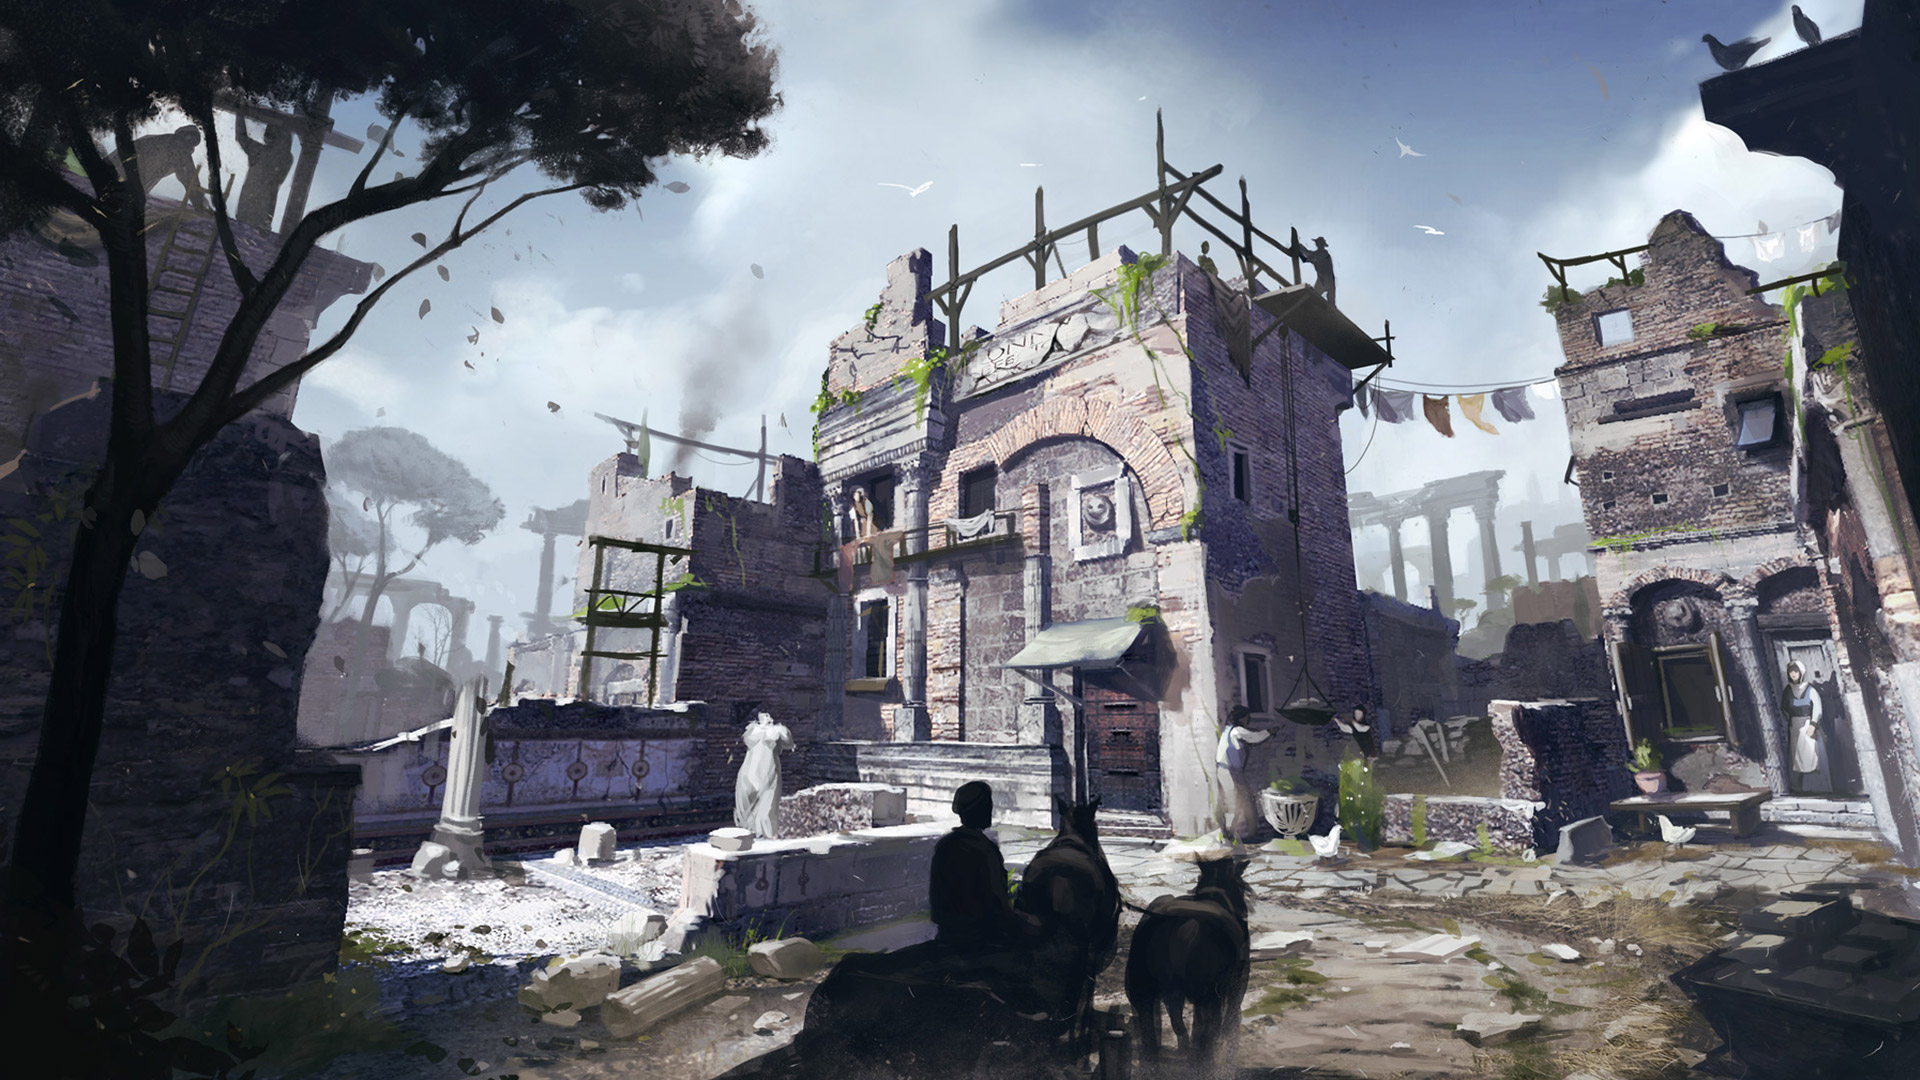 Assassin's Creed: Brotherhood Wallpaper in 1920x1080